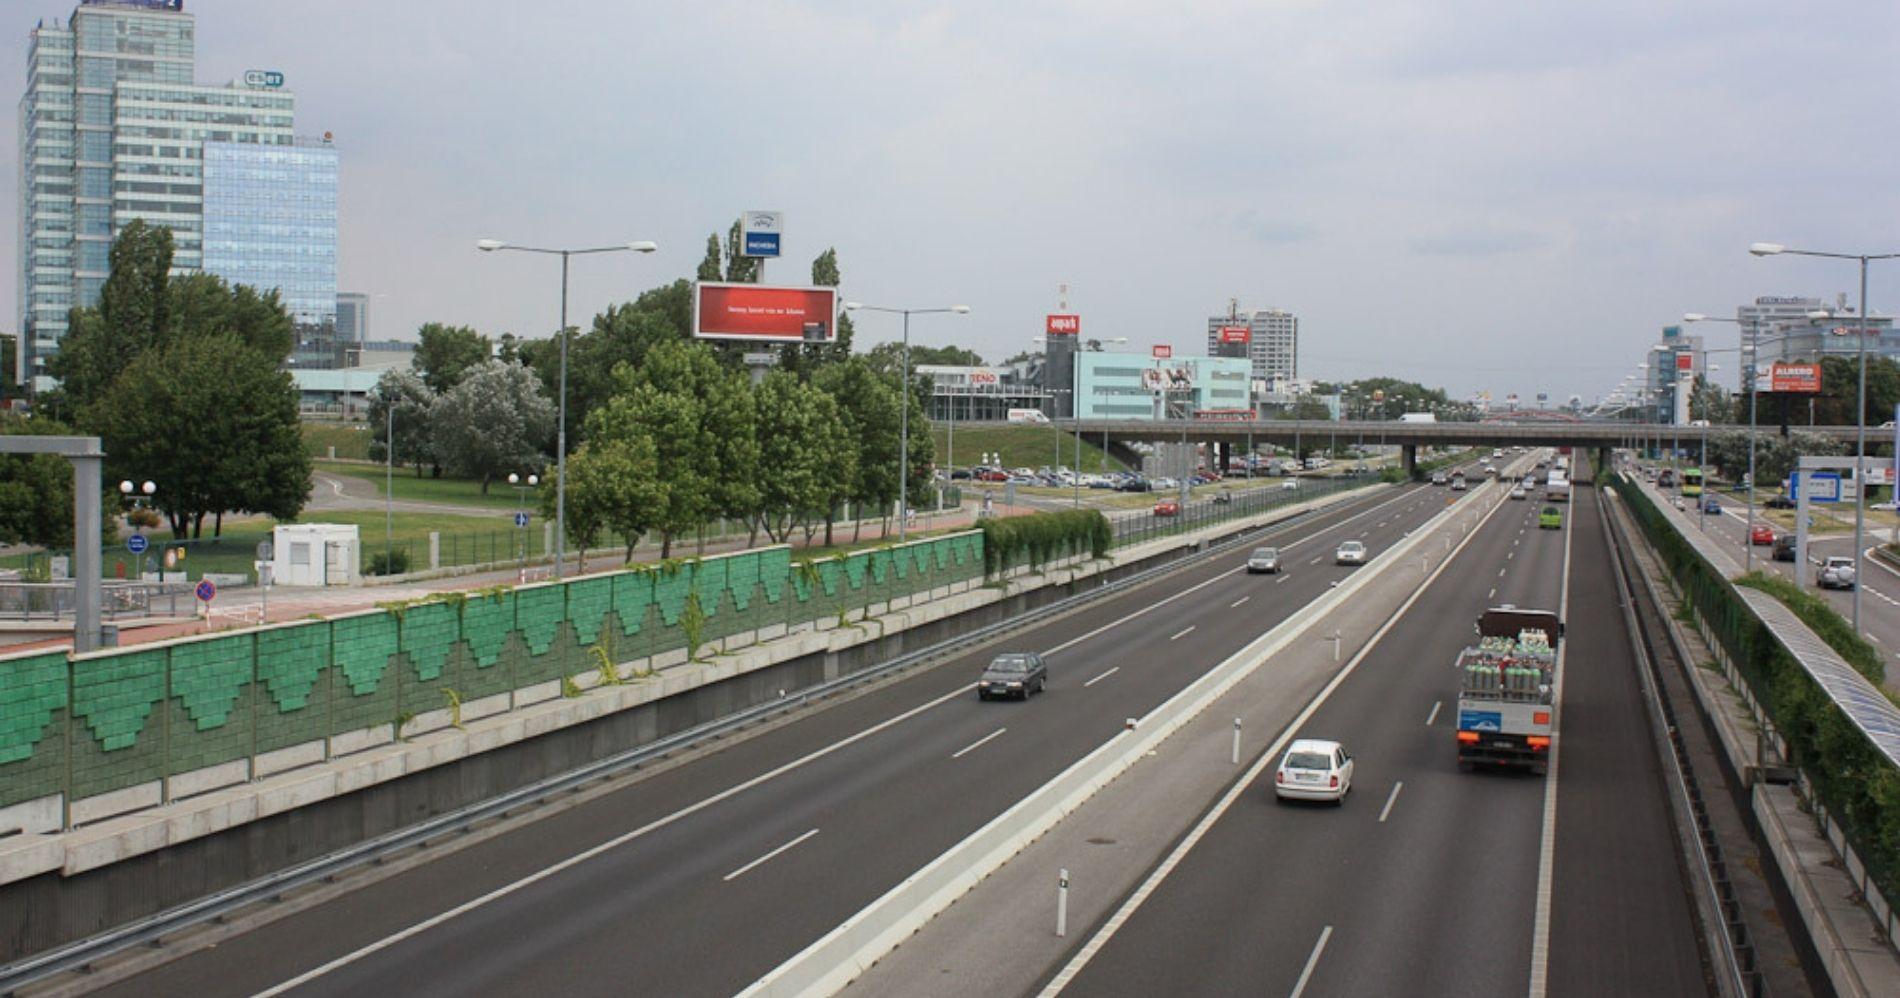 Traffic illustration Web Bisnis Muda - Image: Flickr